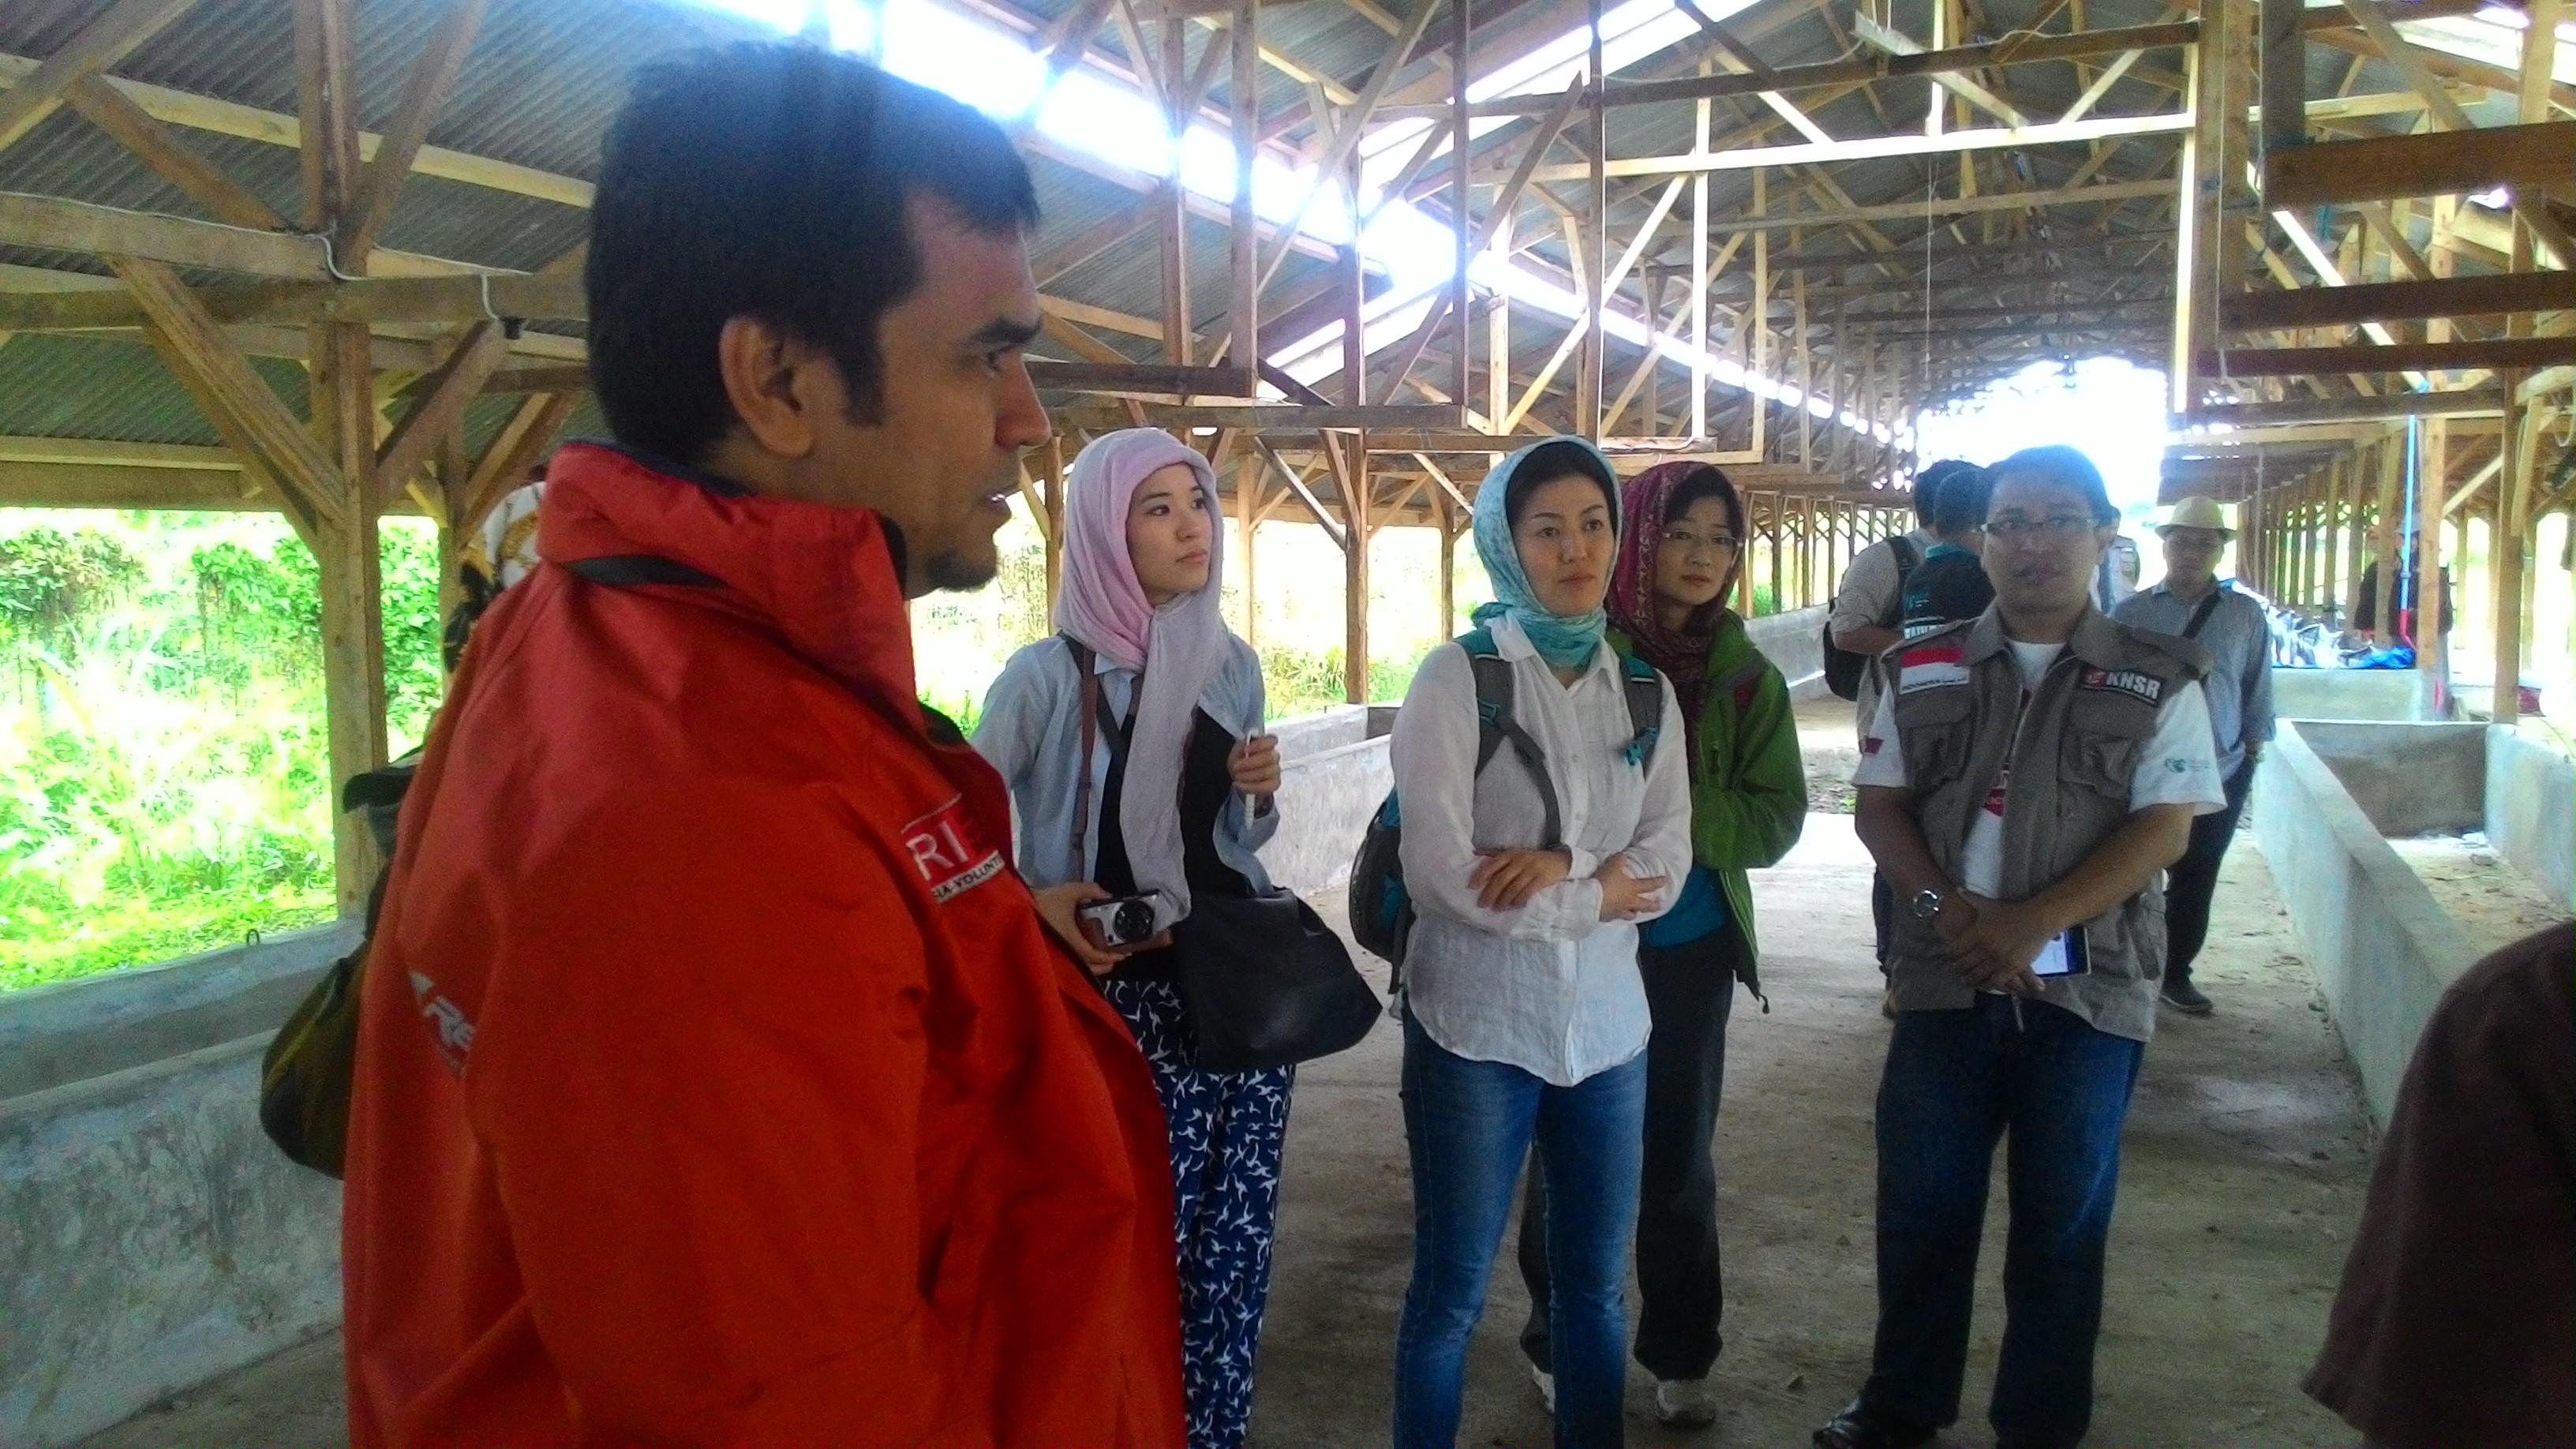 Tiga Peneliti Jepang Kunjungi Pengungsi Rohingya di Aceh Utara